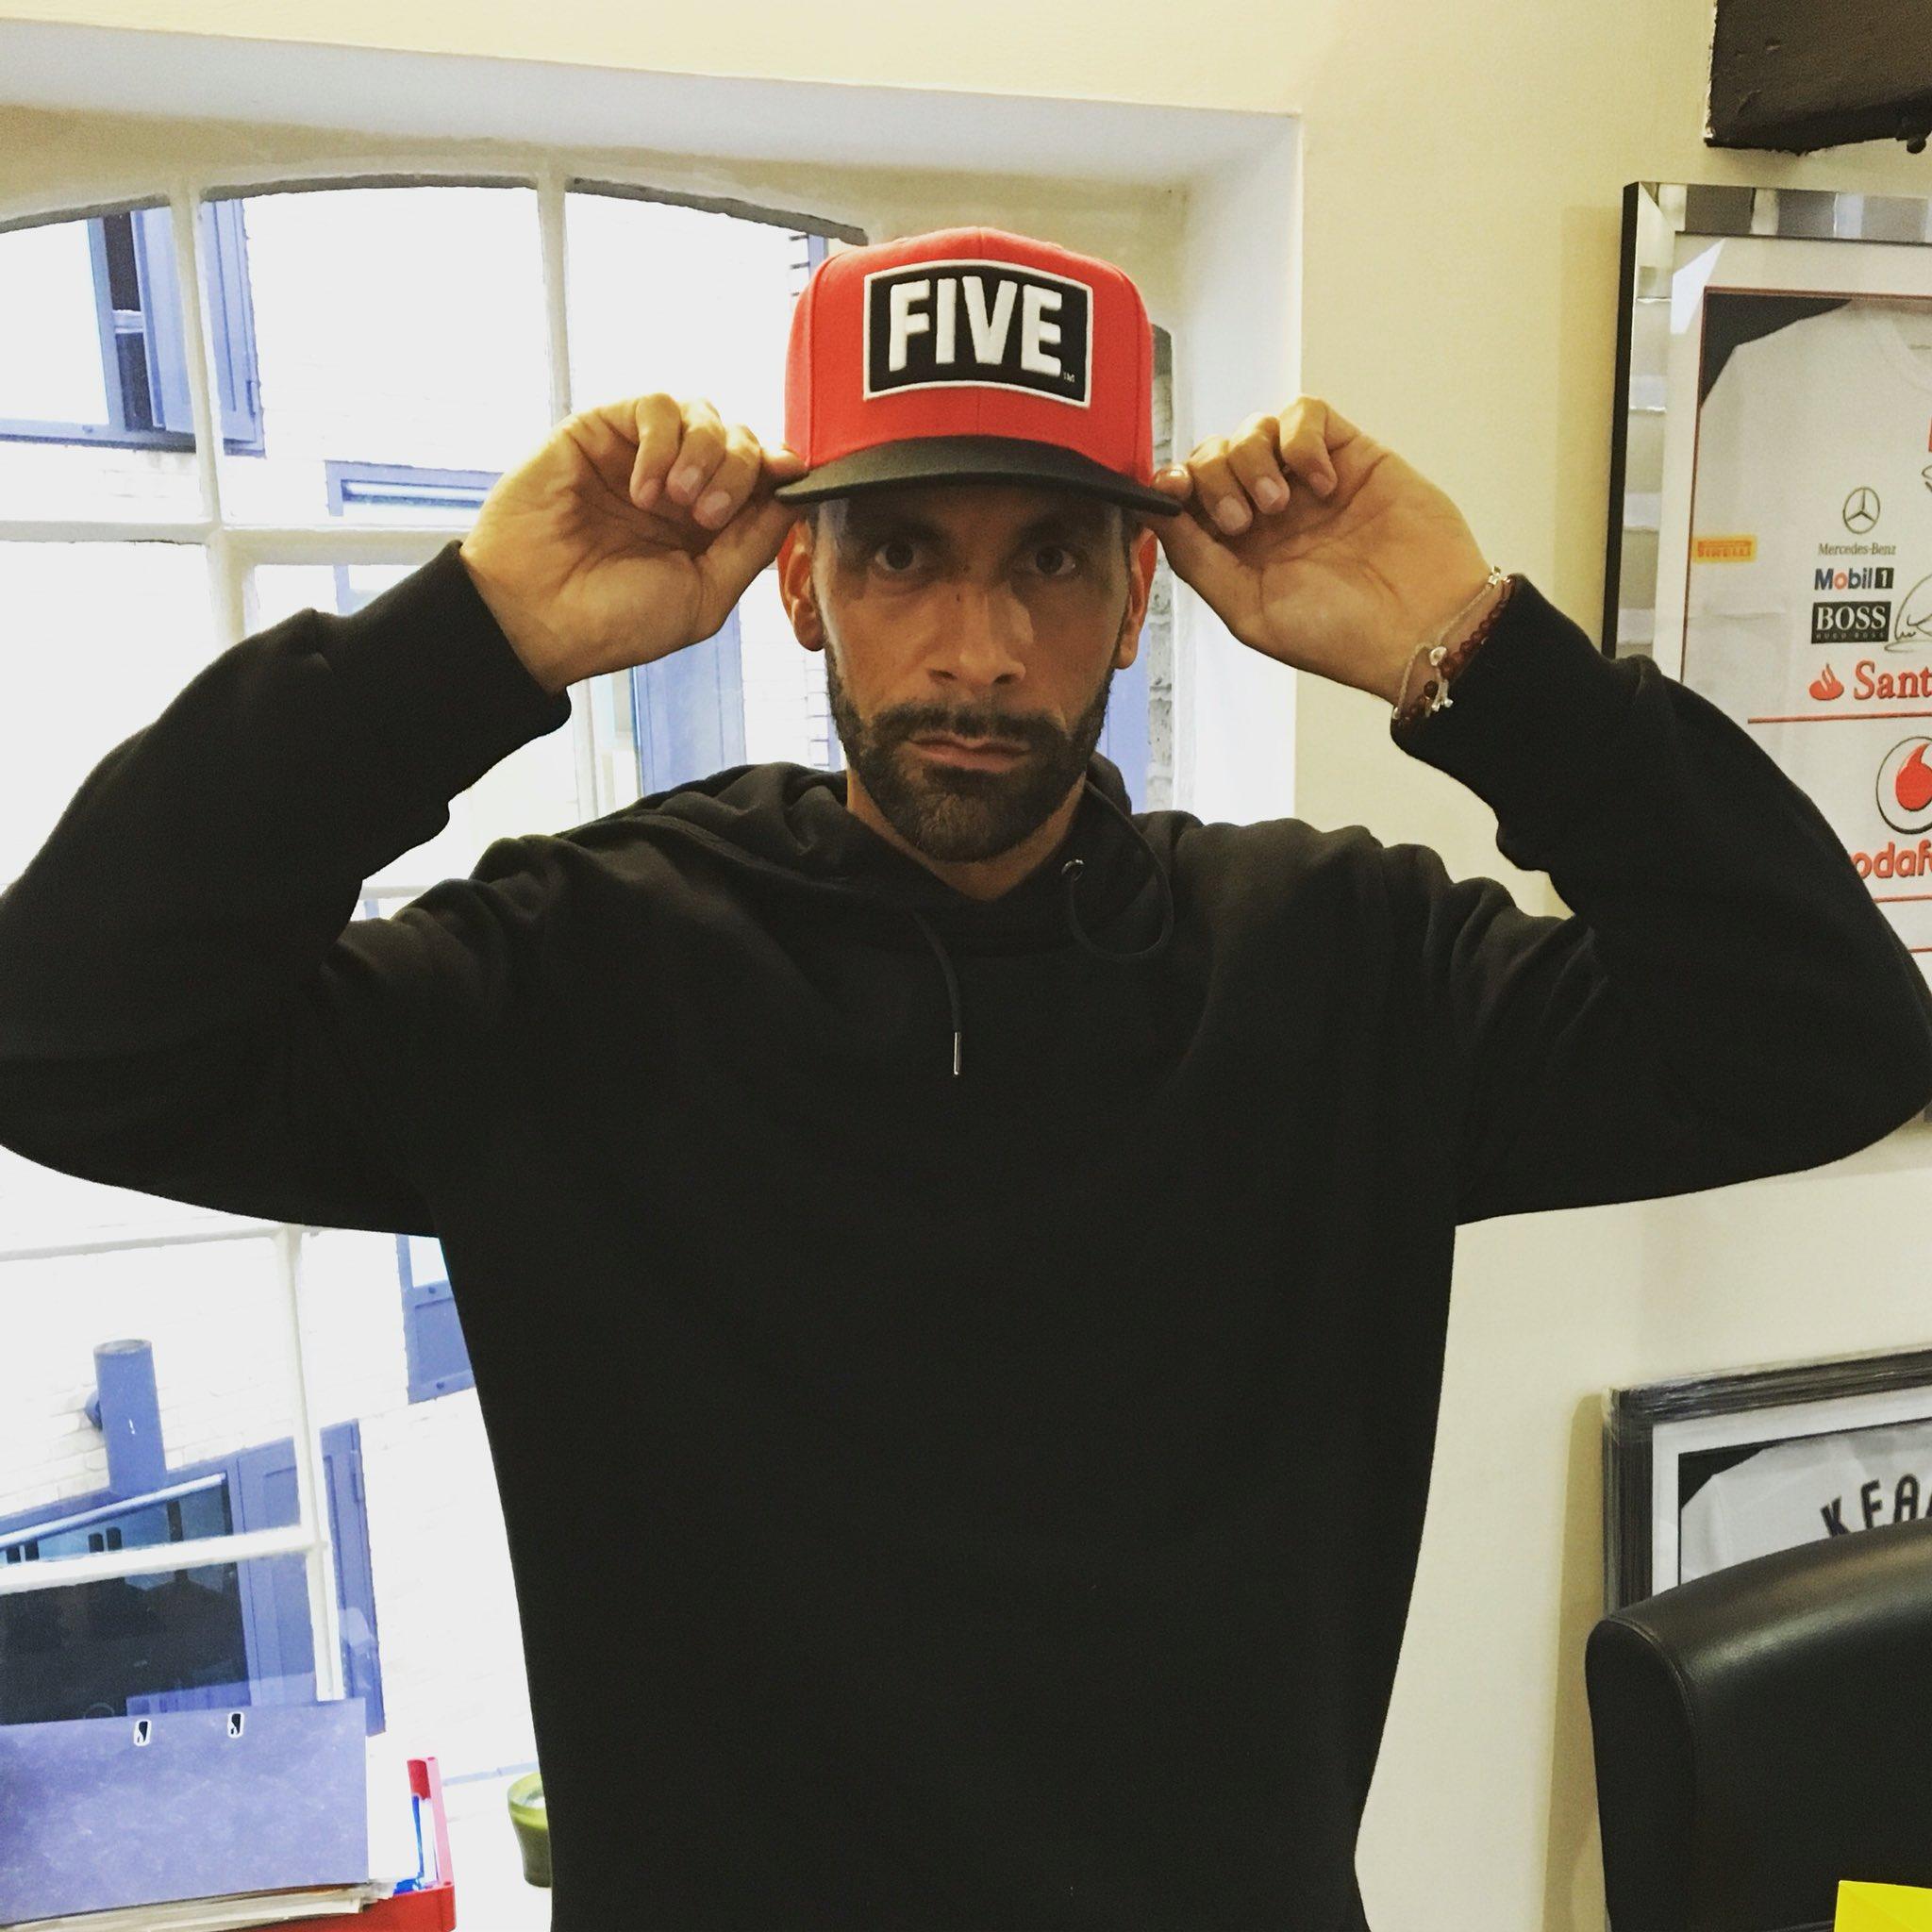 BRAND NEW #FIVE Snapbacks online now.. Head over to @5mag - https://t.co/6O33uzTtLO https://t.co/jPmhQ0lQkq